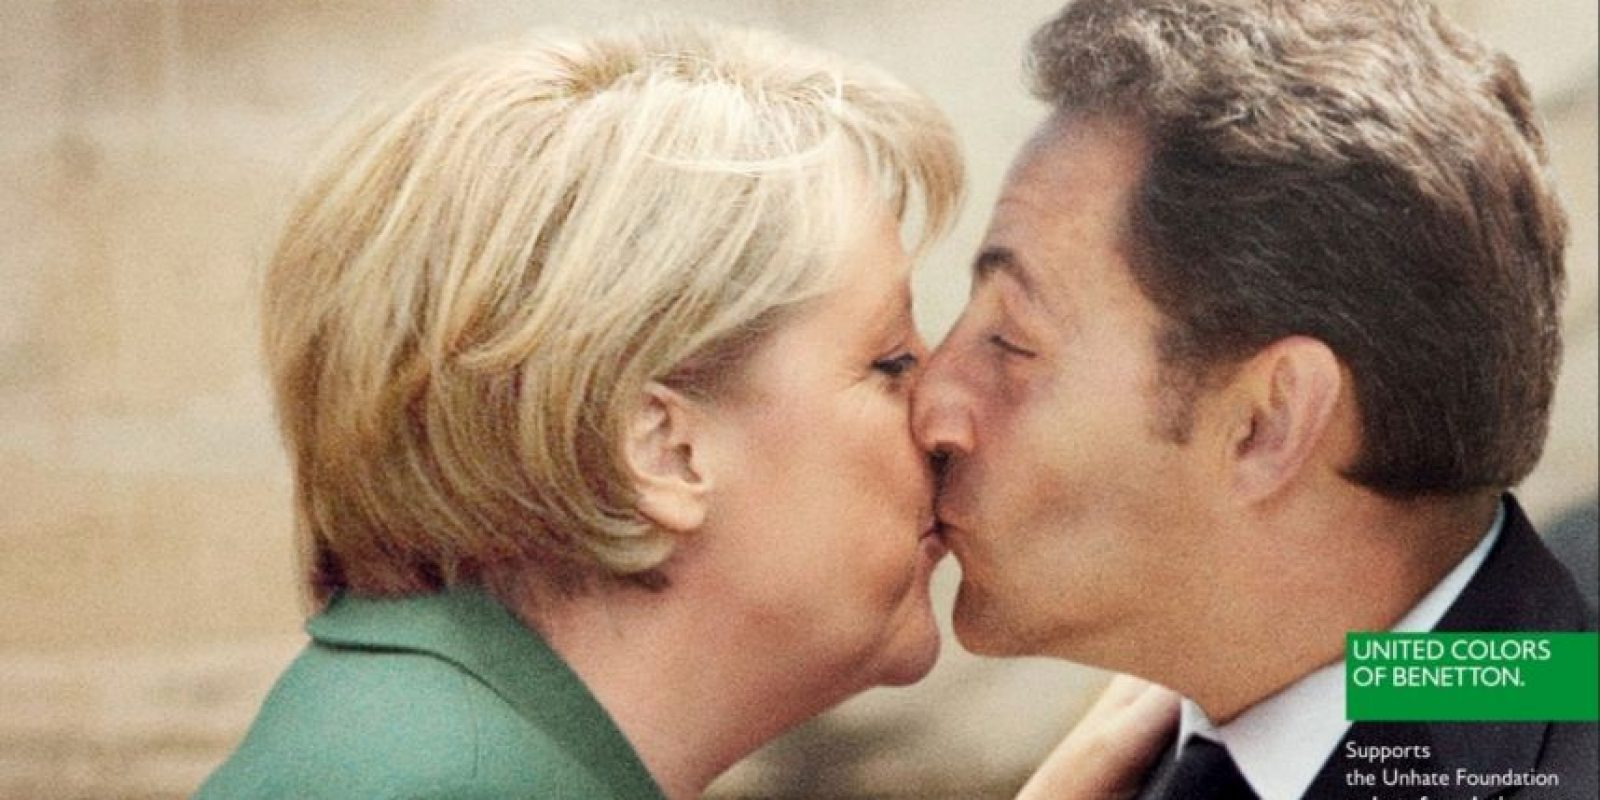 Benetton no ganó. Foto:Benetton